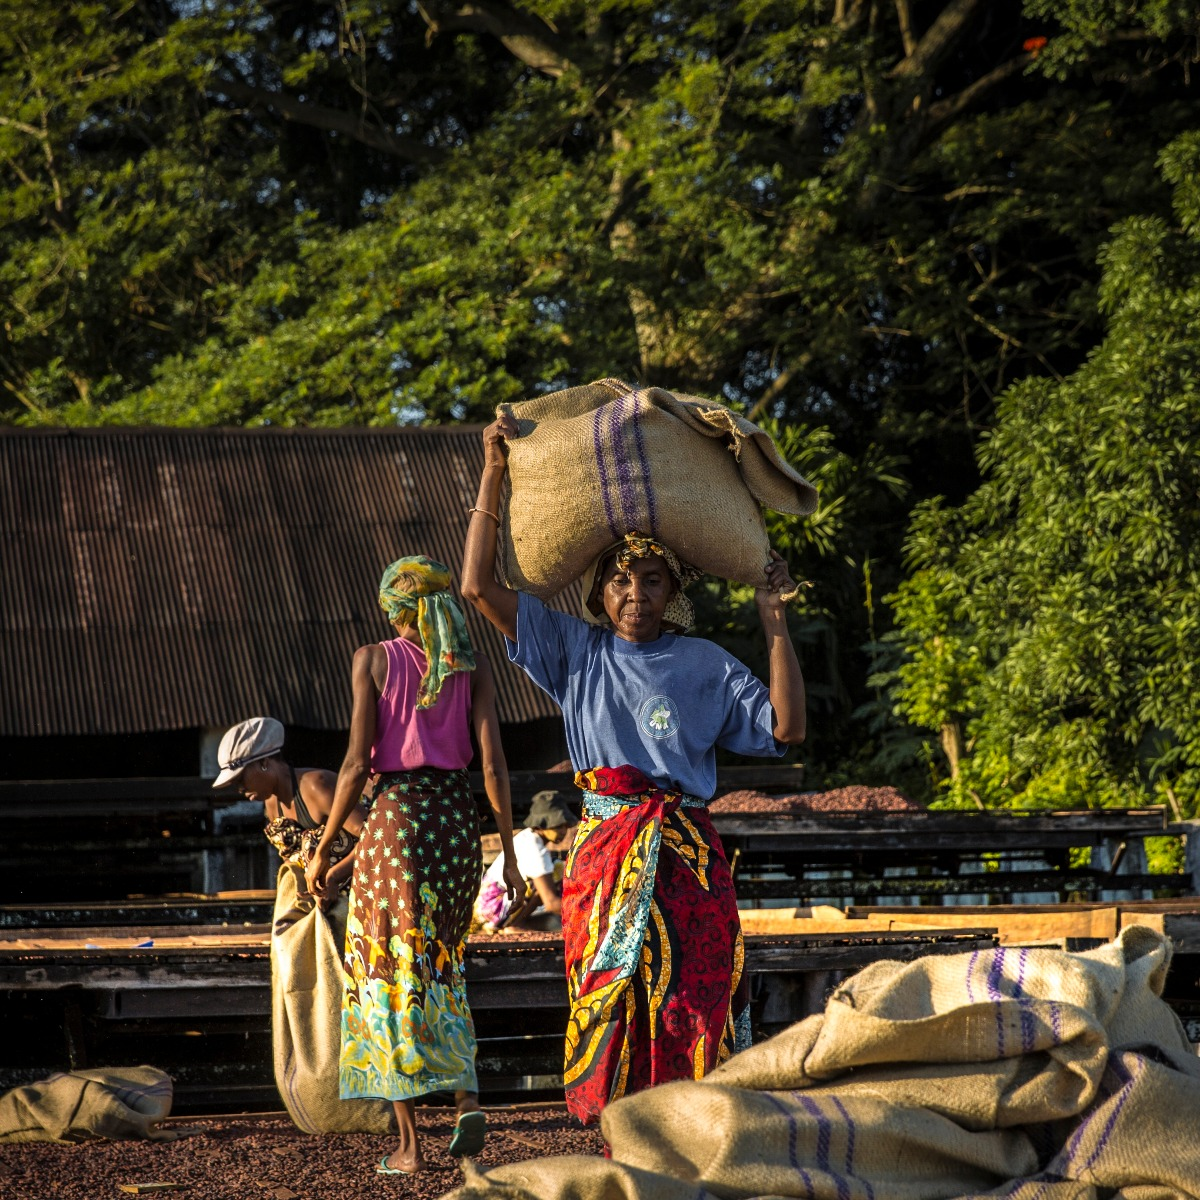 MANJARI 64% Millot Plantation Info